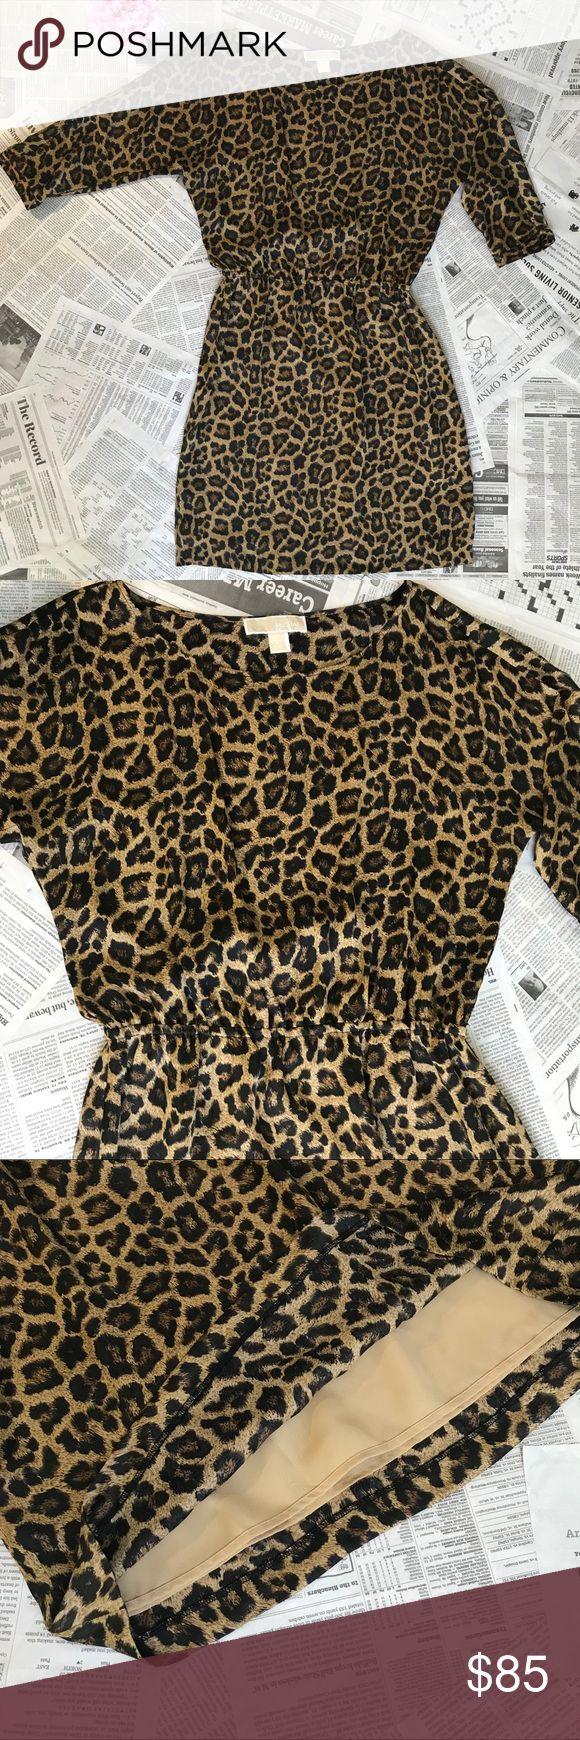 I just added this listing on Poshmark: Michael Kors Leopard Print Dress. #shopmycloset #poshmark #fashion #shopping #style #forsale #Michael Kors #Dresses & Skirts